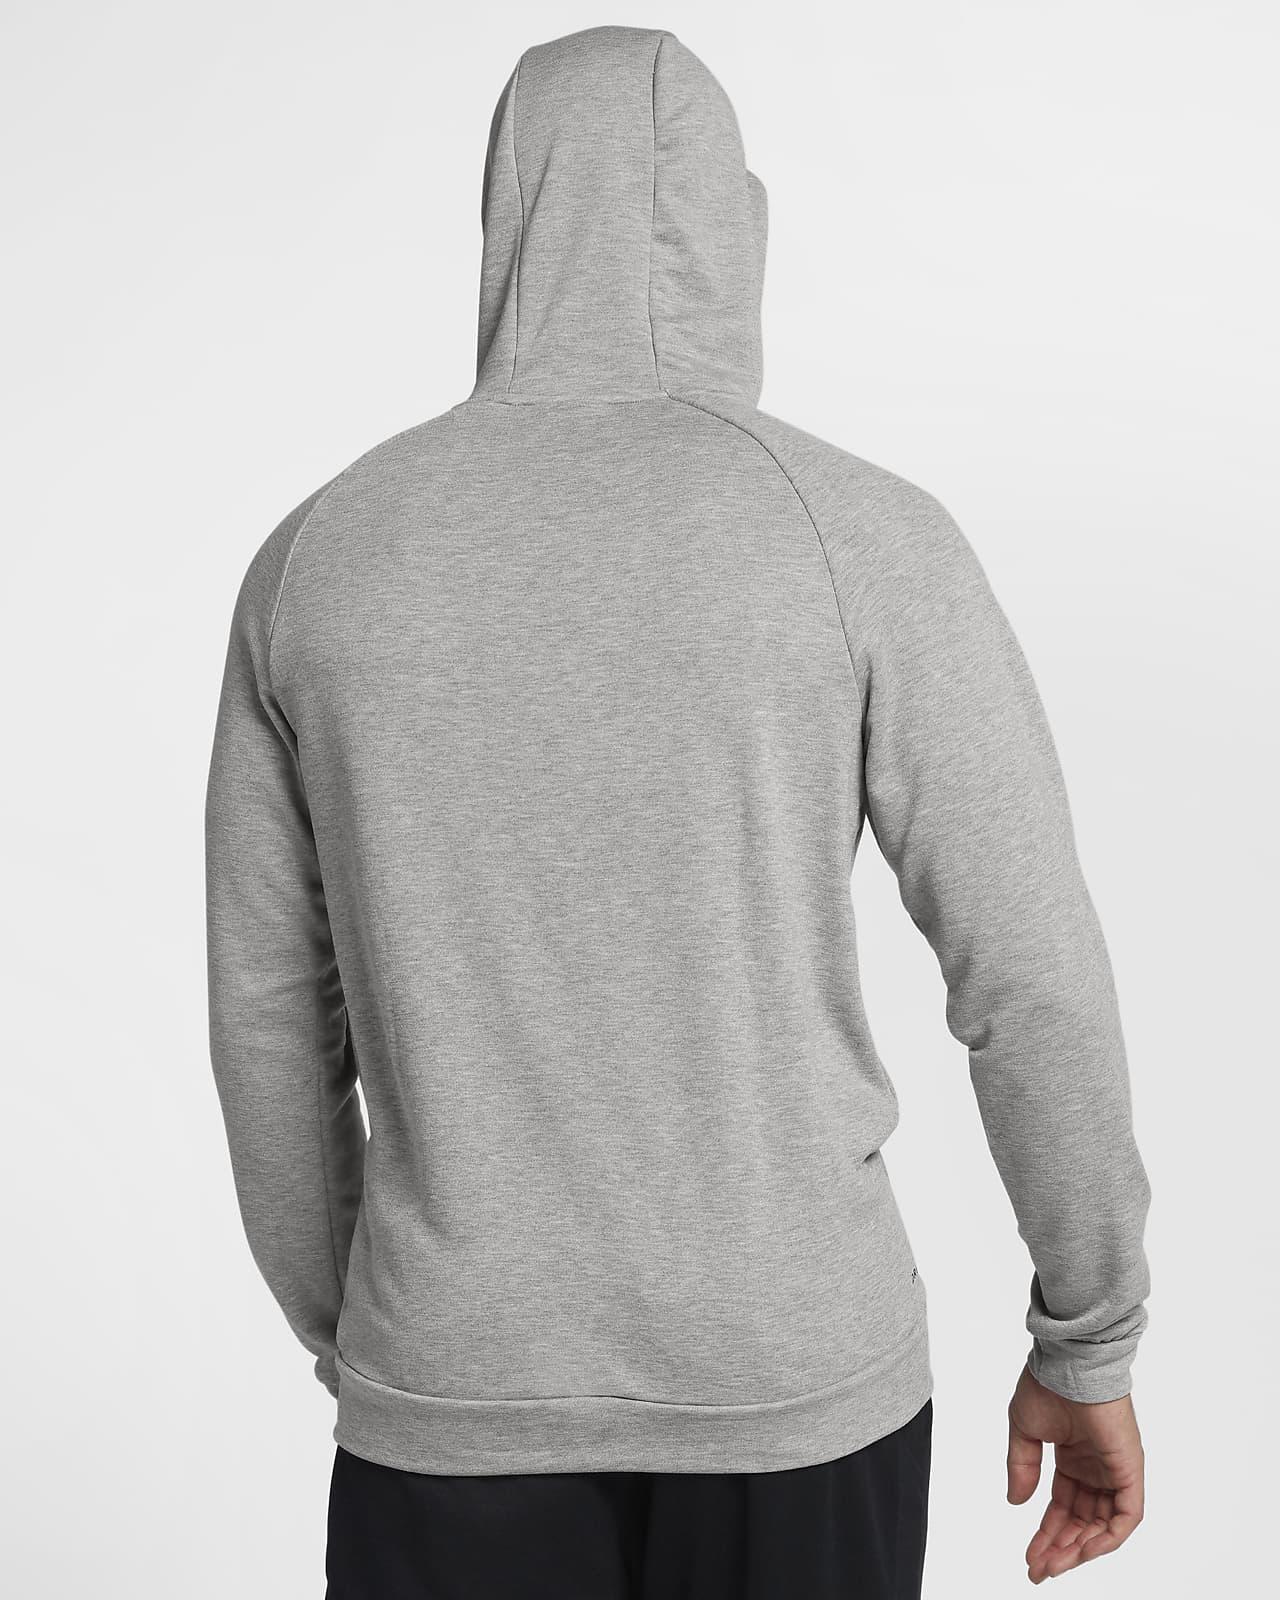 Nike Dri-FIT Men's Pullover Training Hoodie